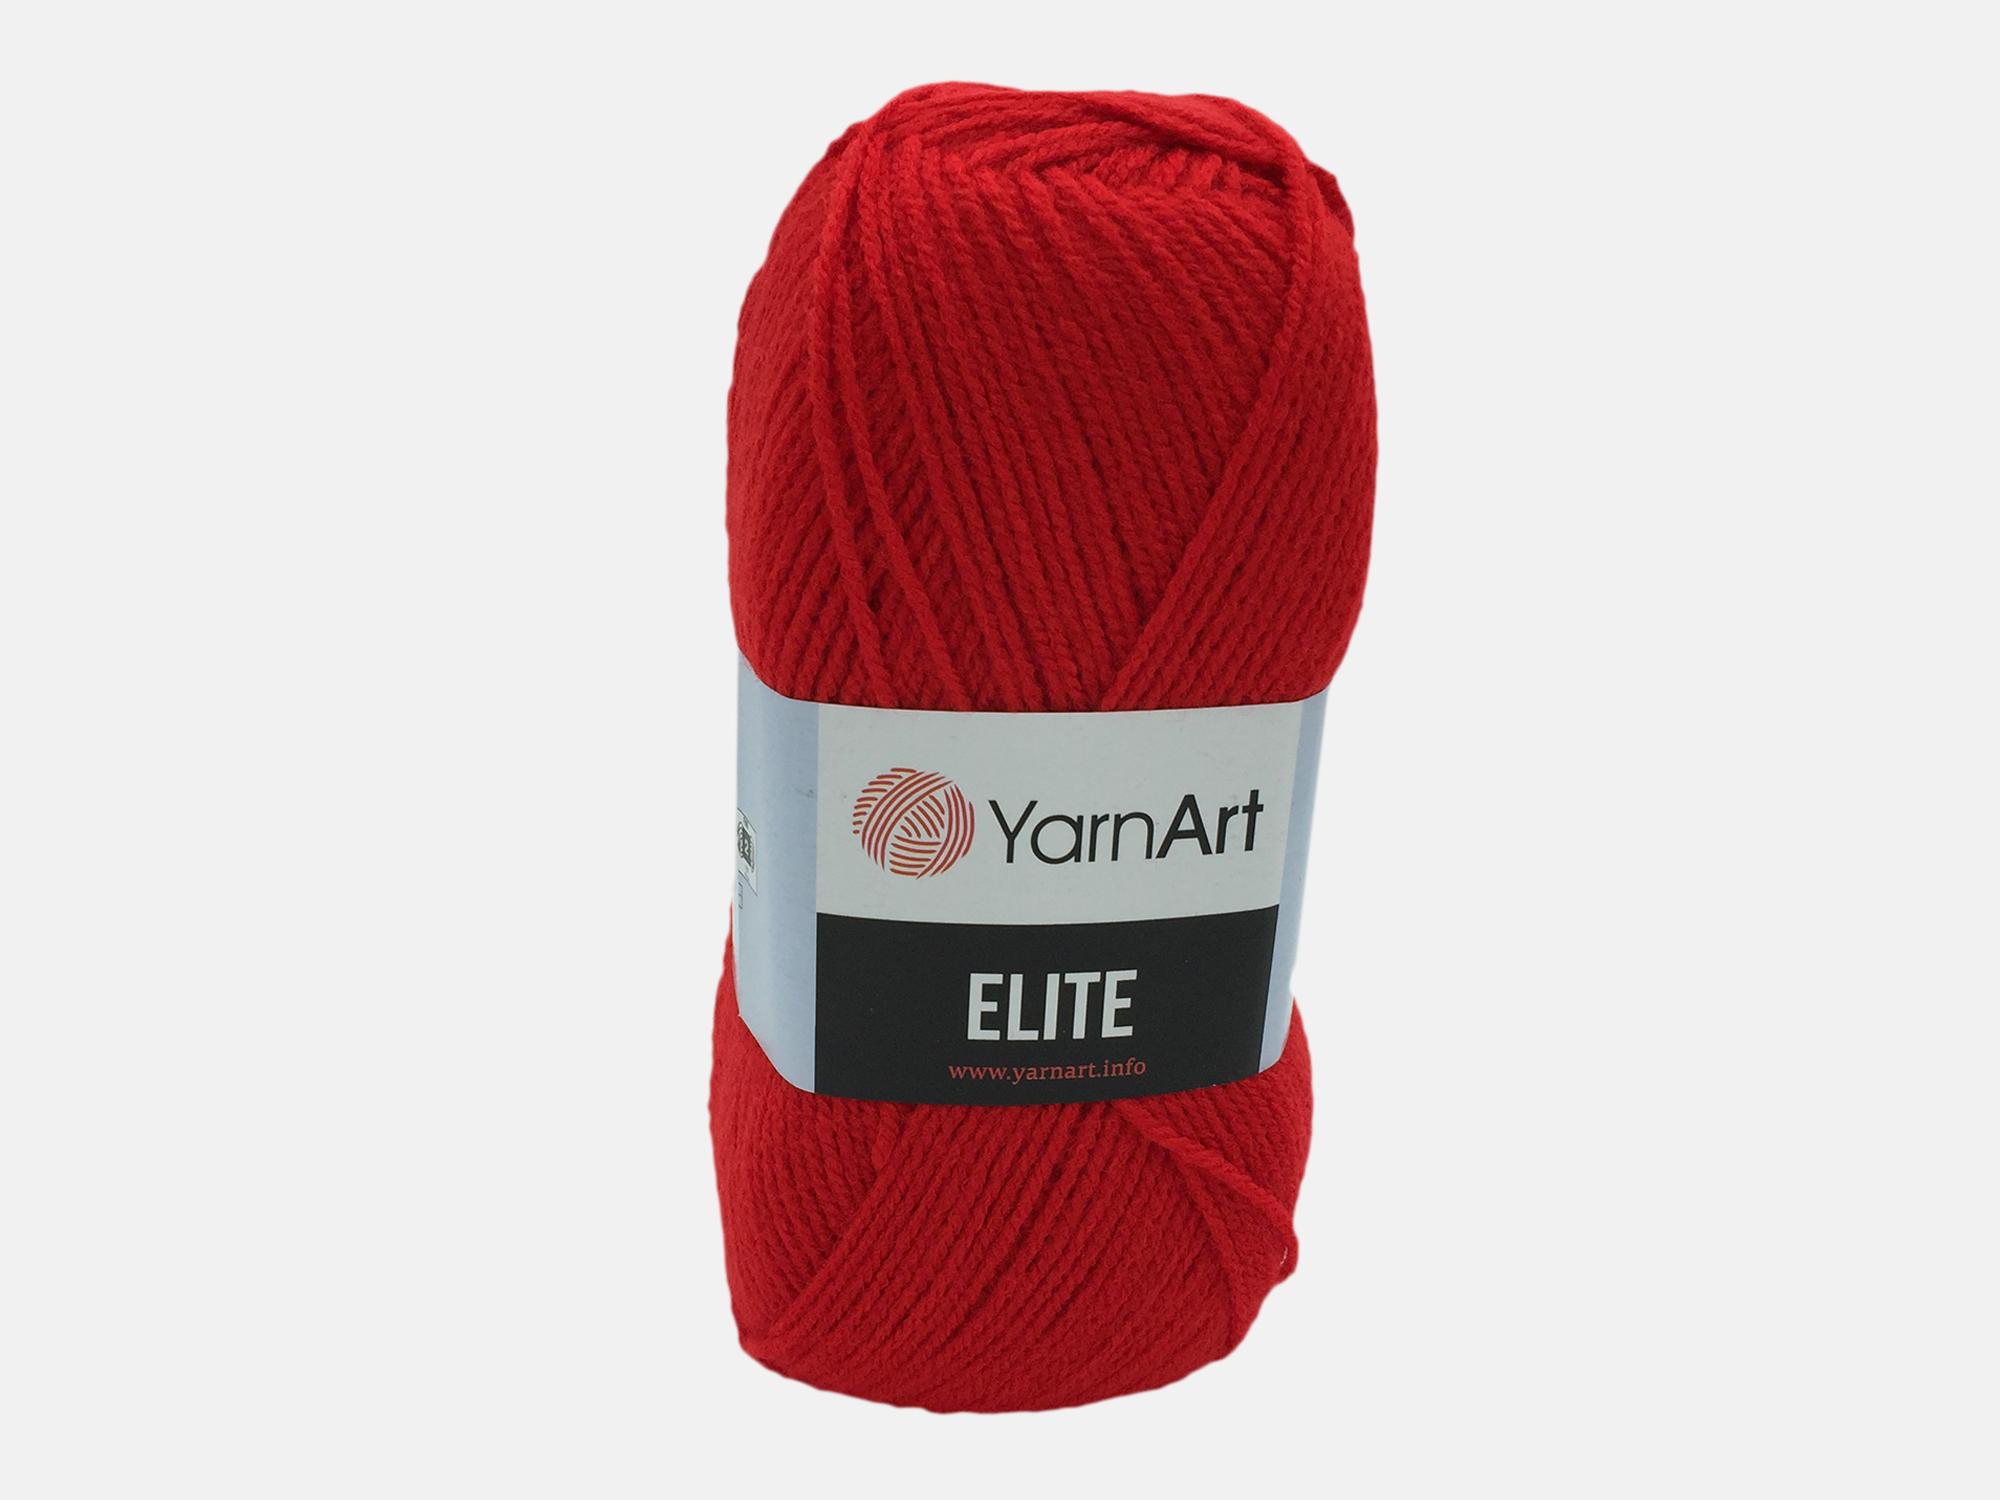 Fire tricotat - ELITE - Rosu - 41 - Yarn-Art